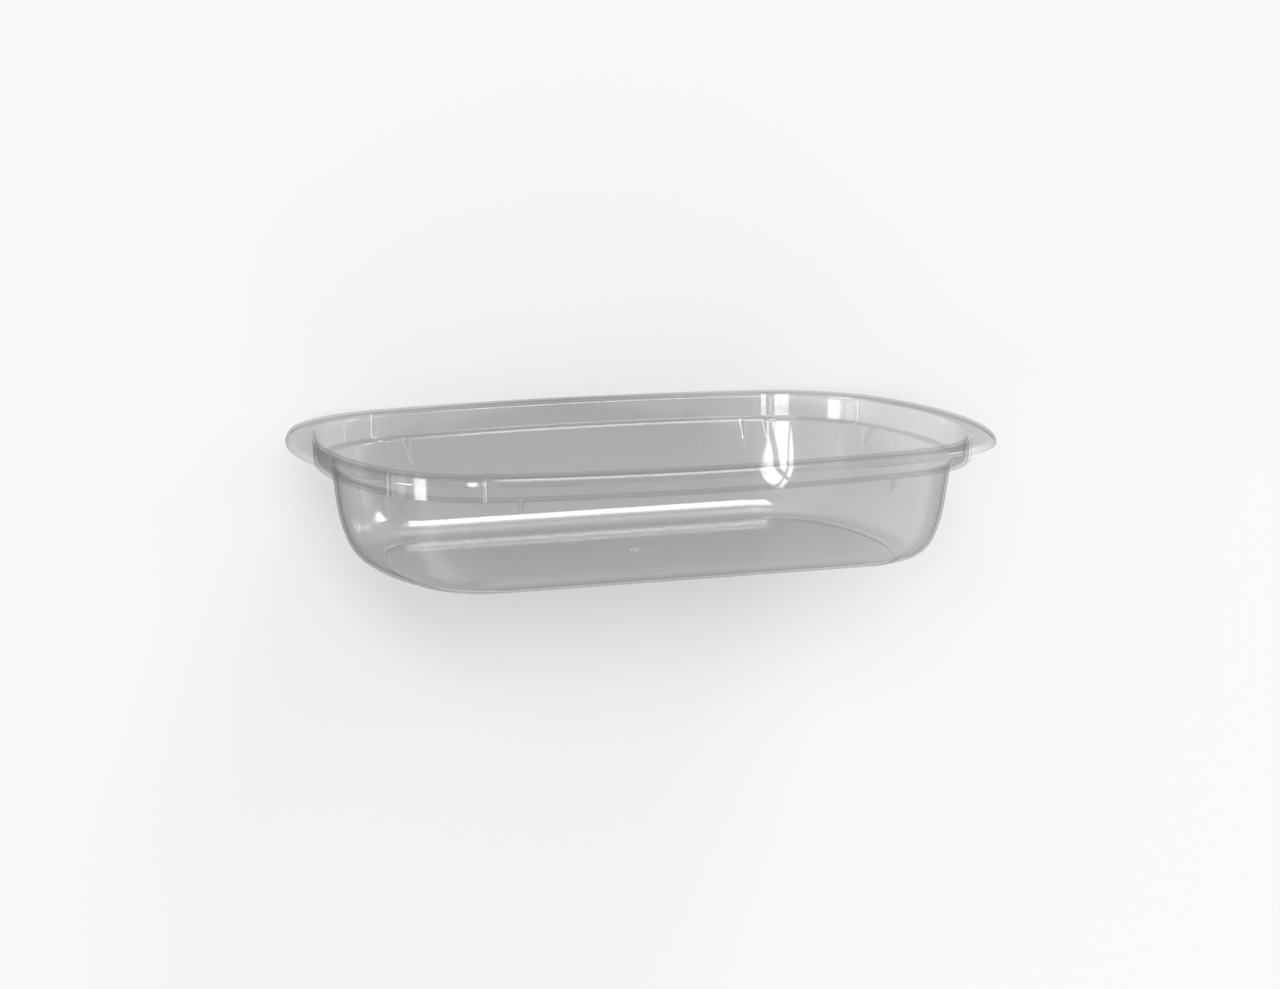 Barquette Euroduo operculable transparente 520 cm3